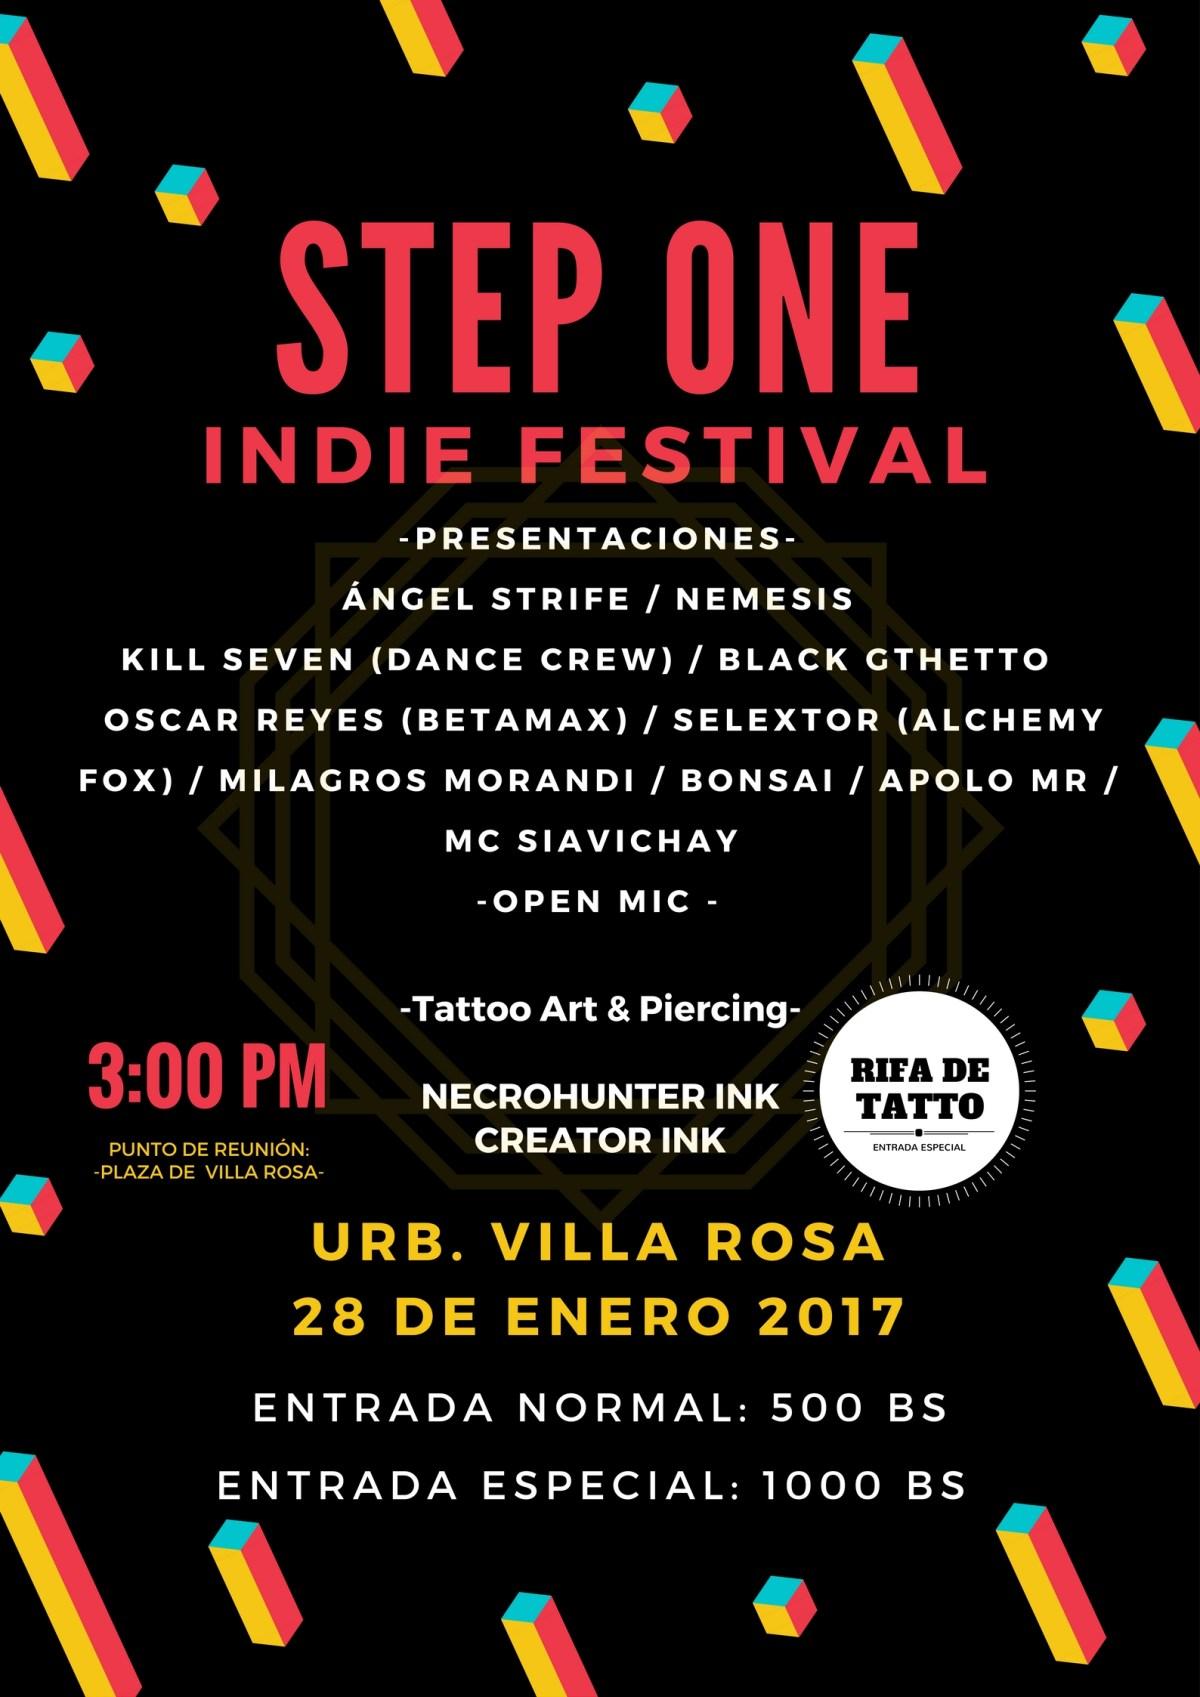 STEP ONE FEST